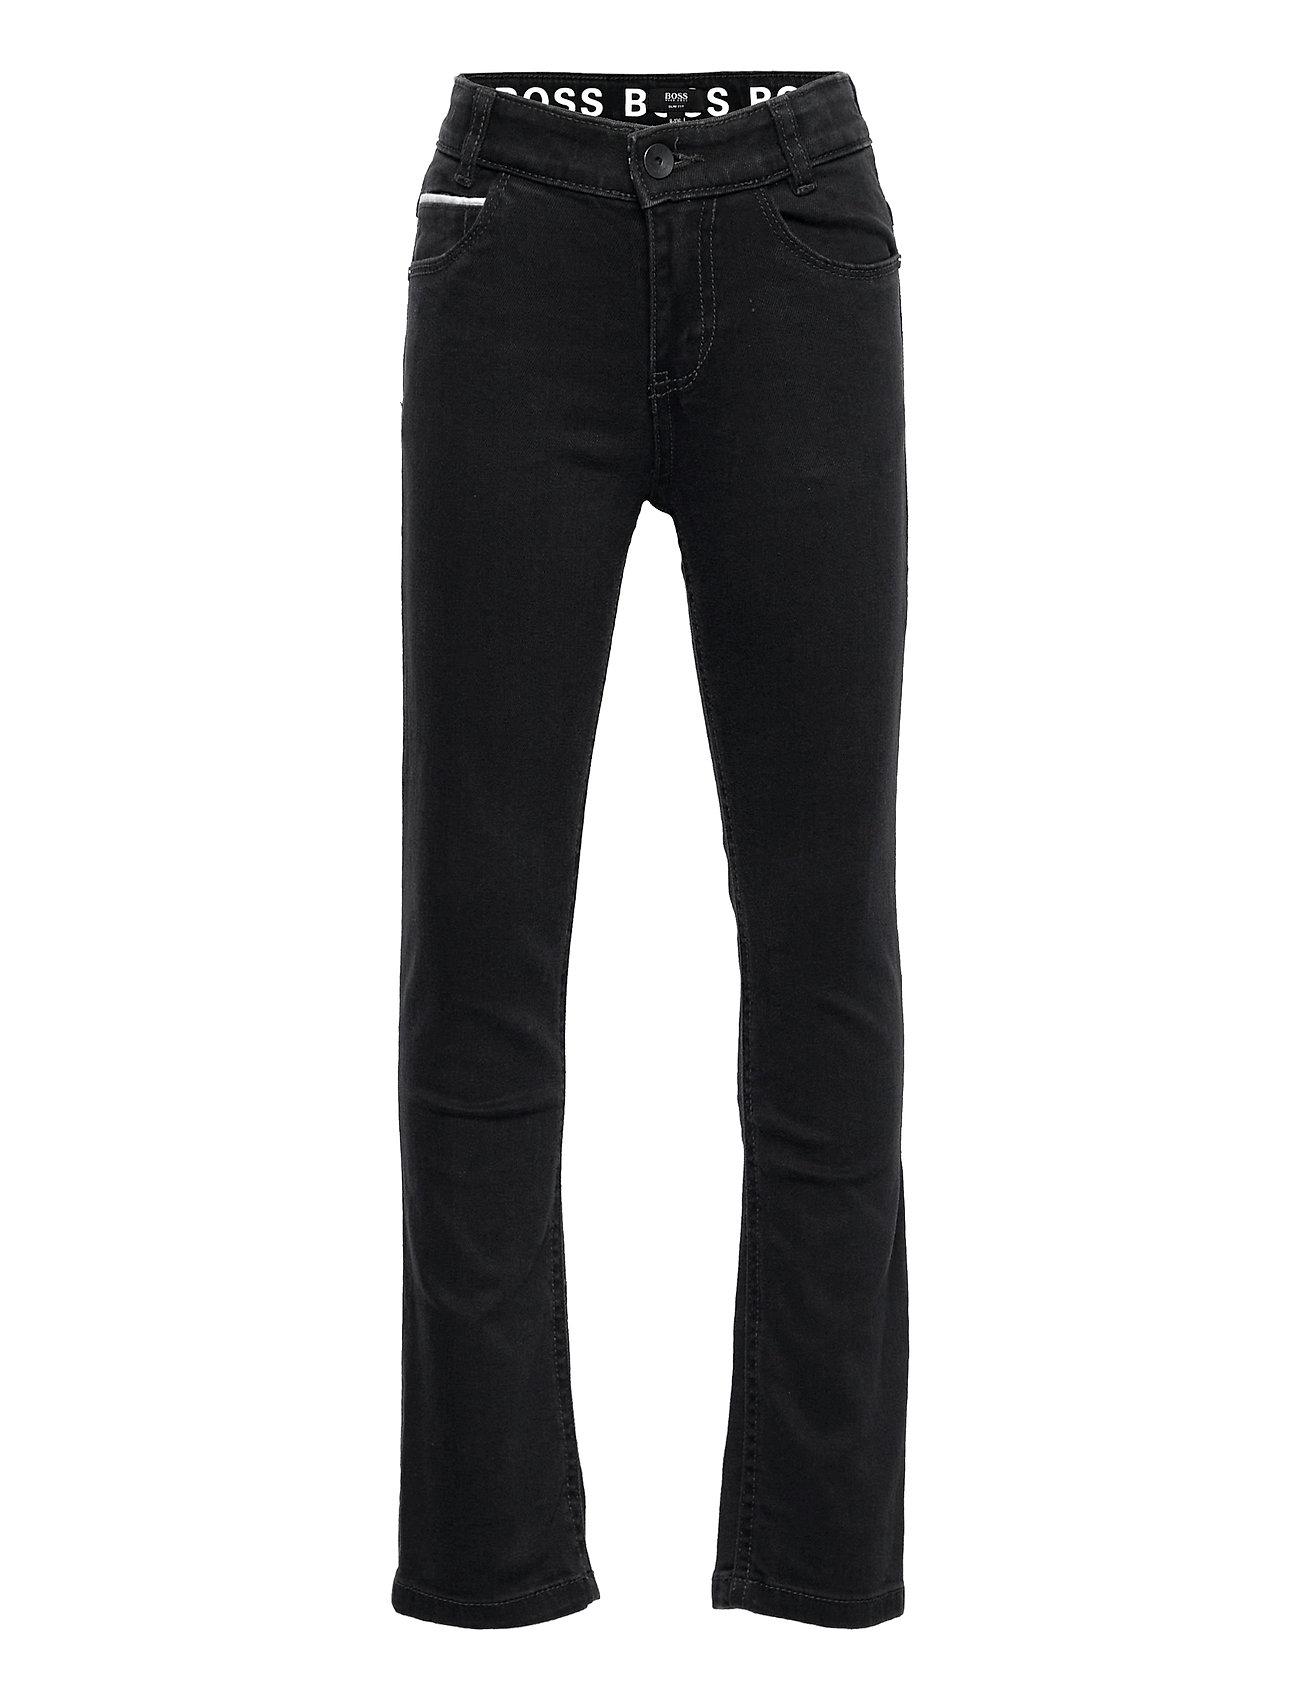 Denim Trousers Jeans Sort BOSS